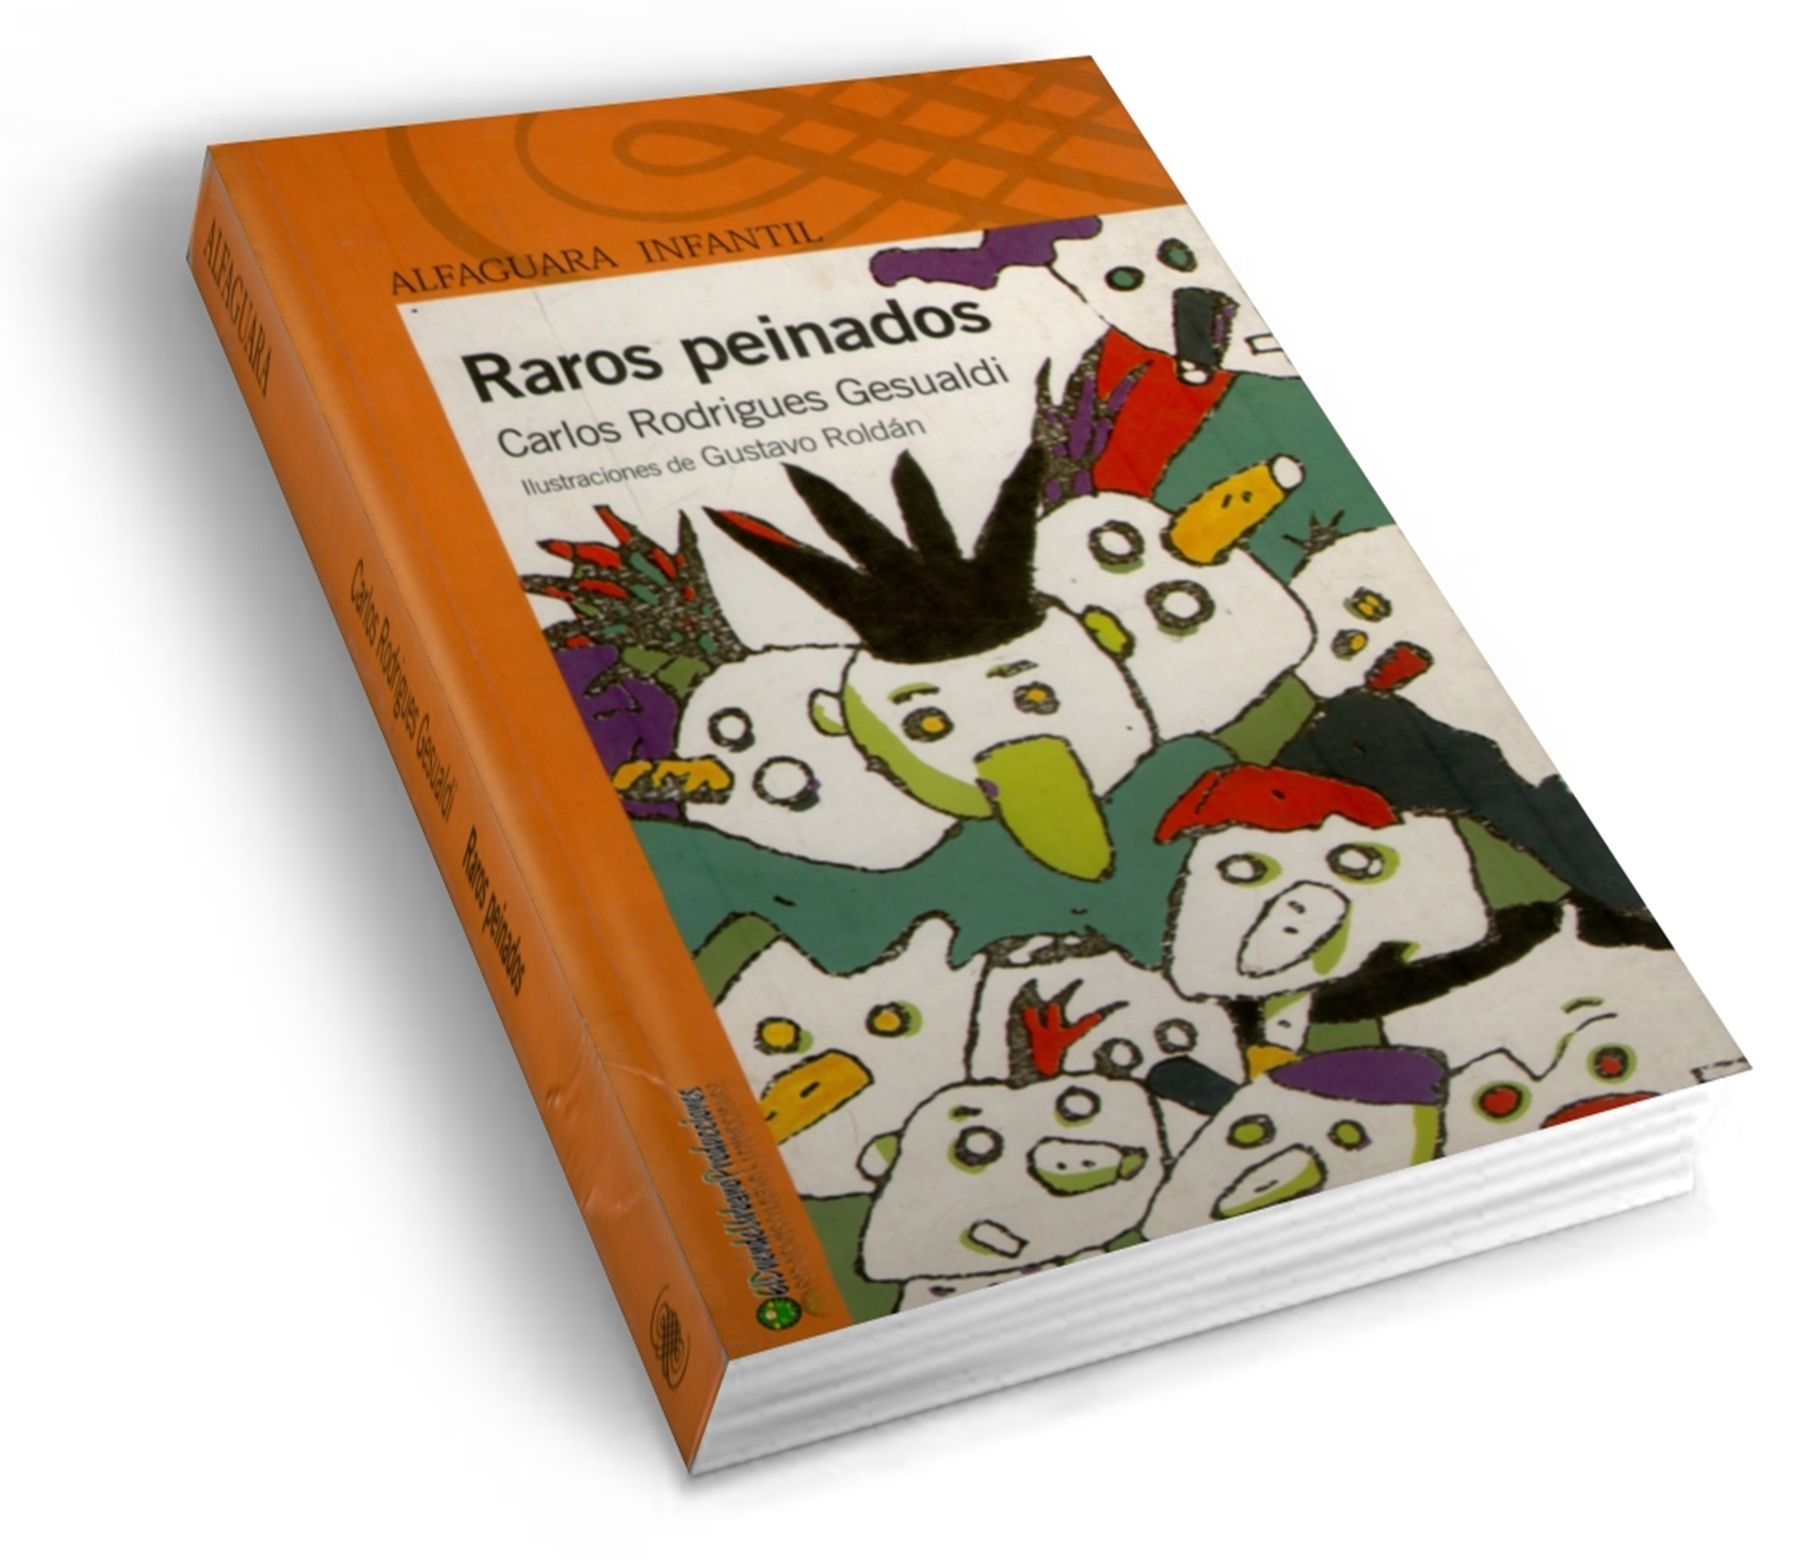 libros alfaguara infantil usados